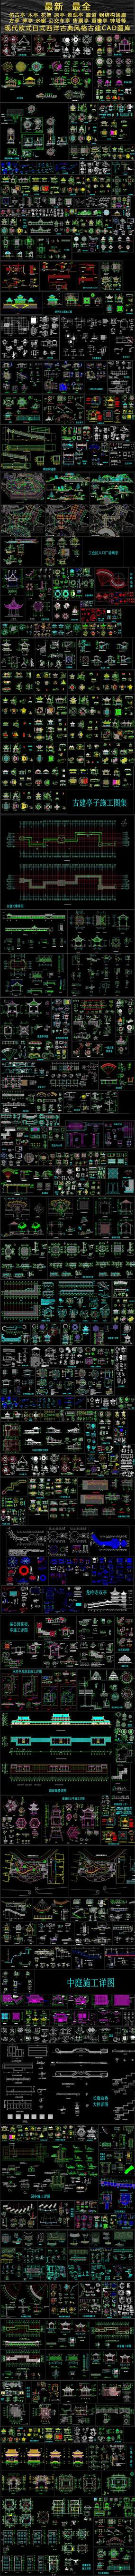 CAD图库建筑图